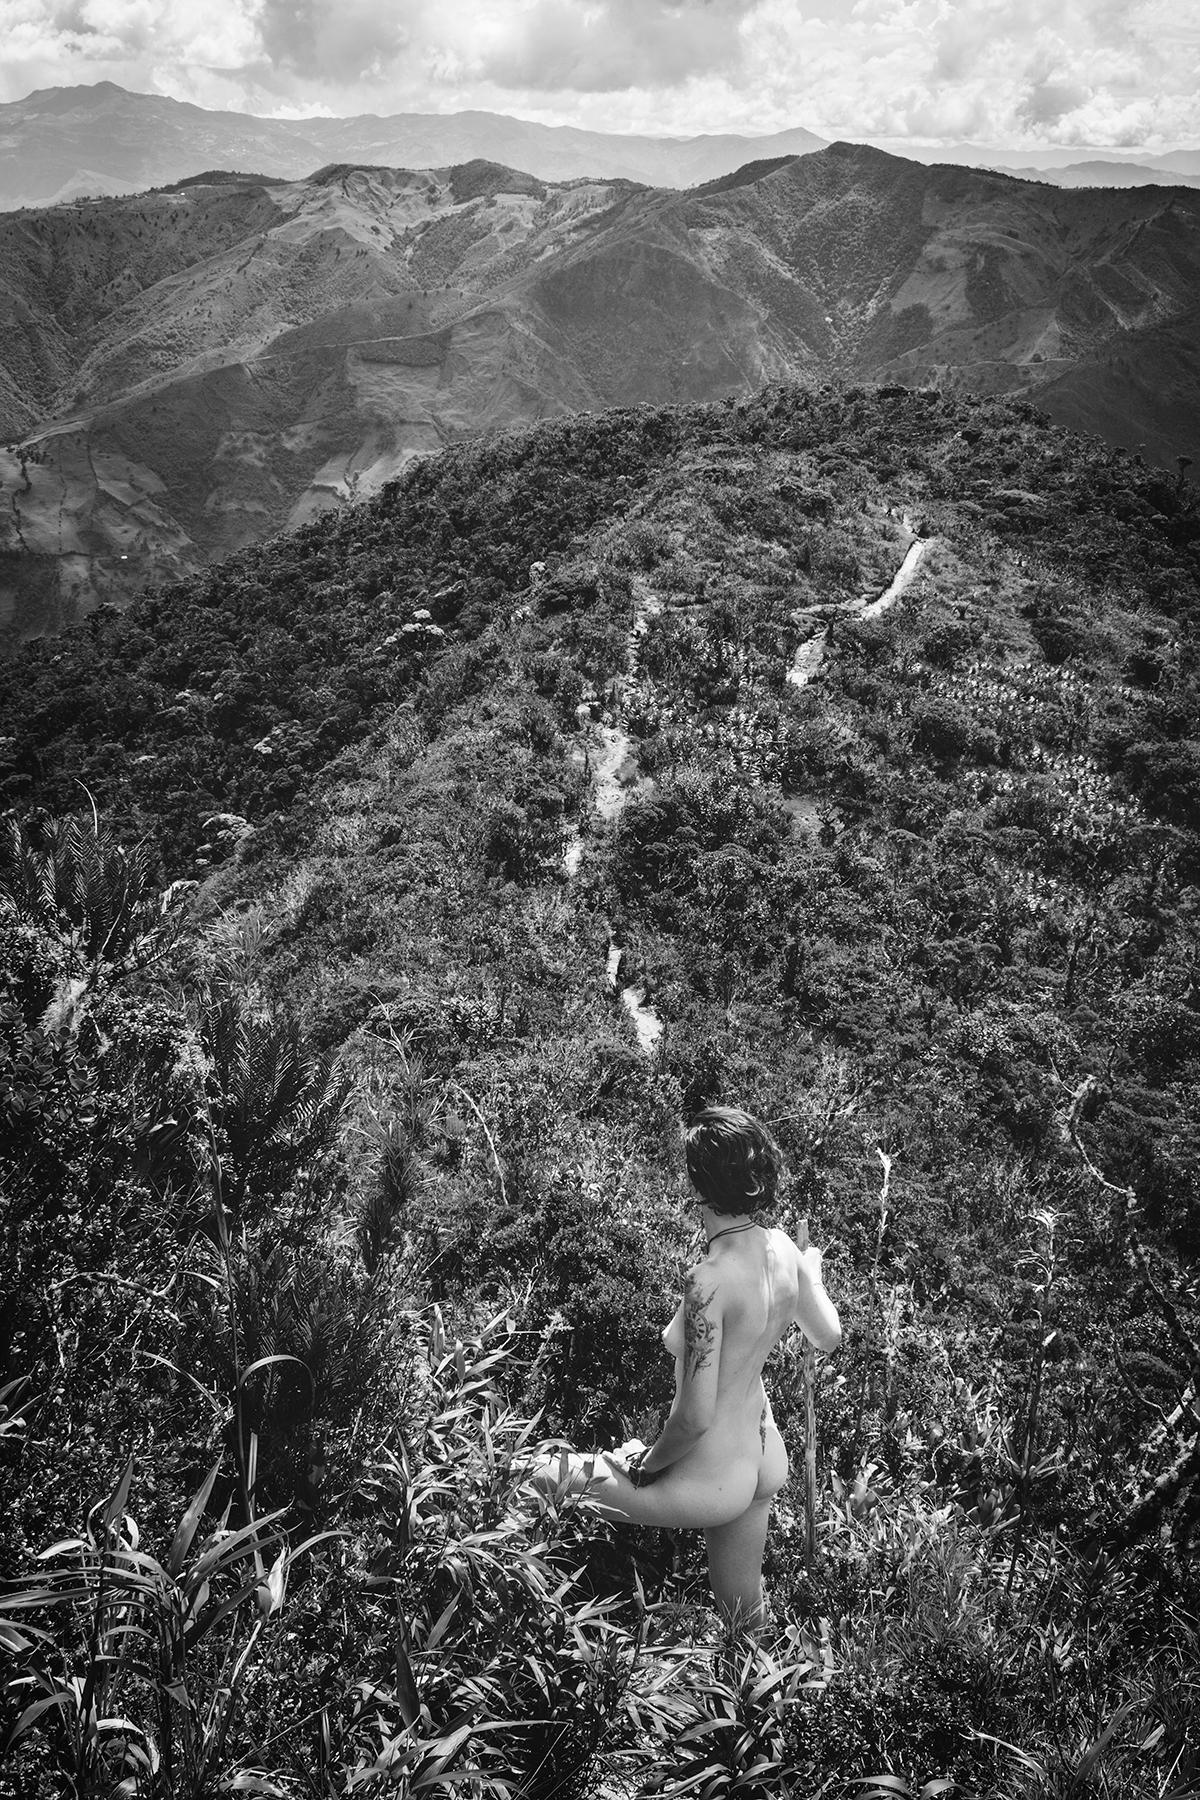 Celine_Fernbach_InTheWild_Podocarpus-Ecuador_04.jpg